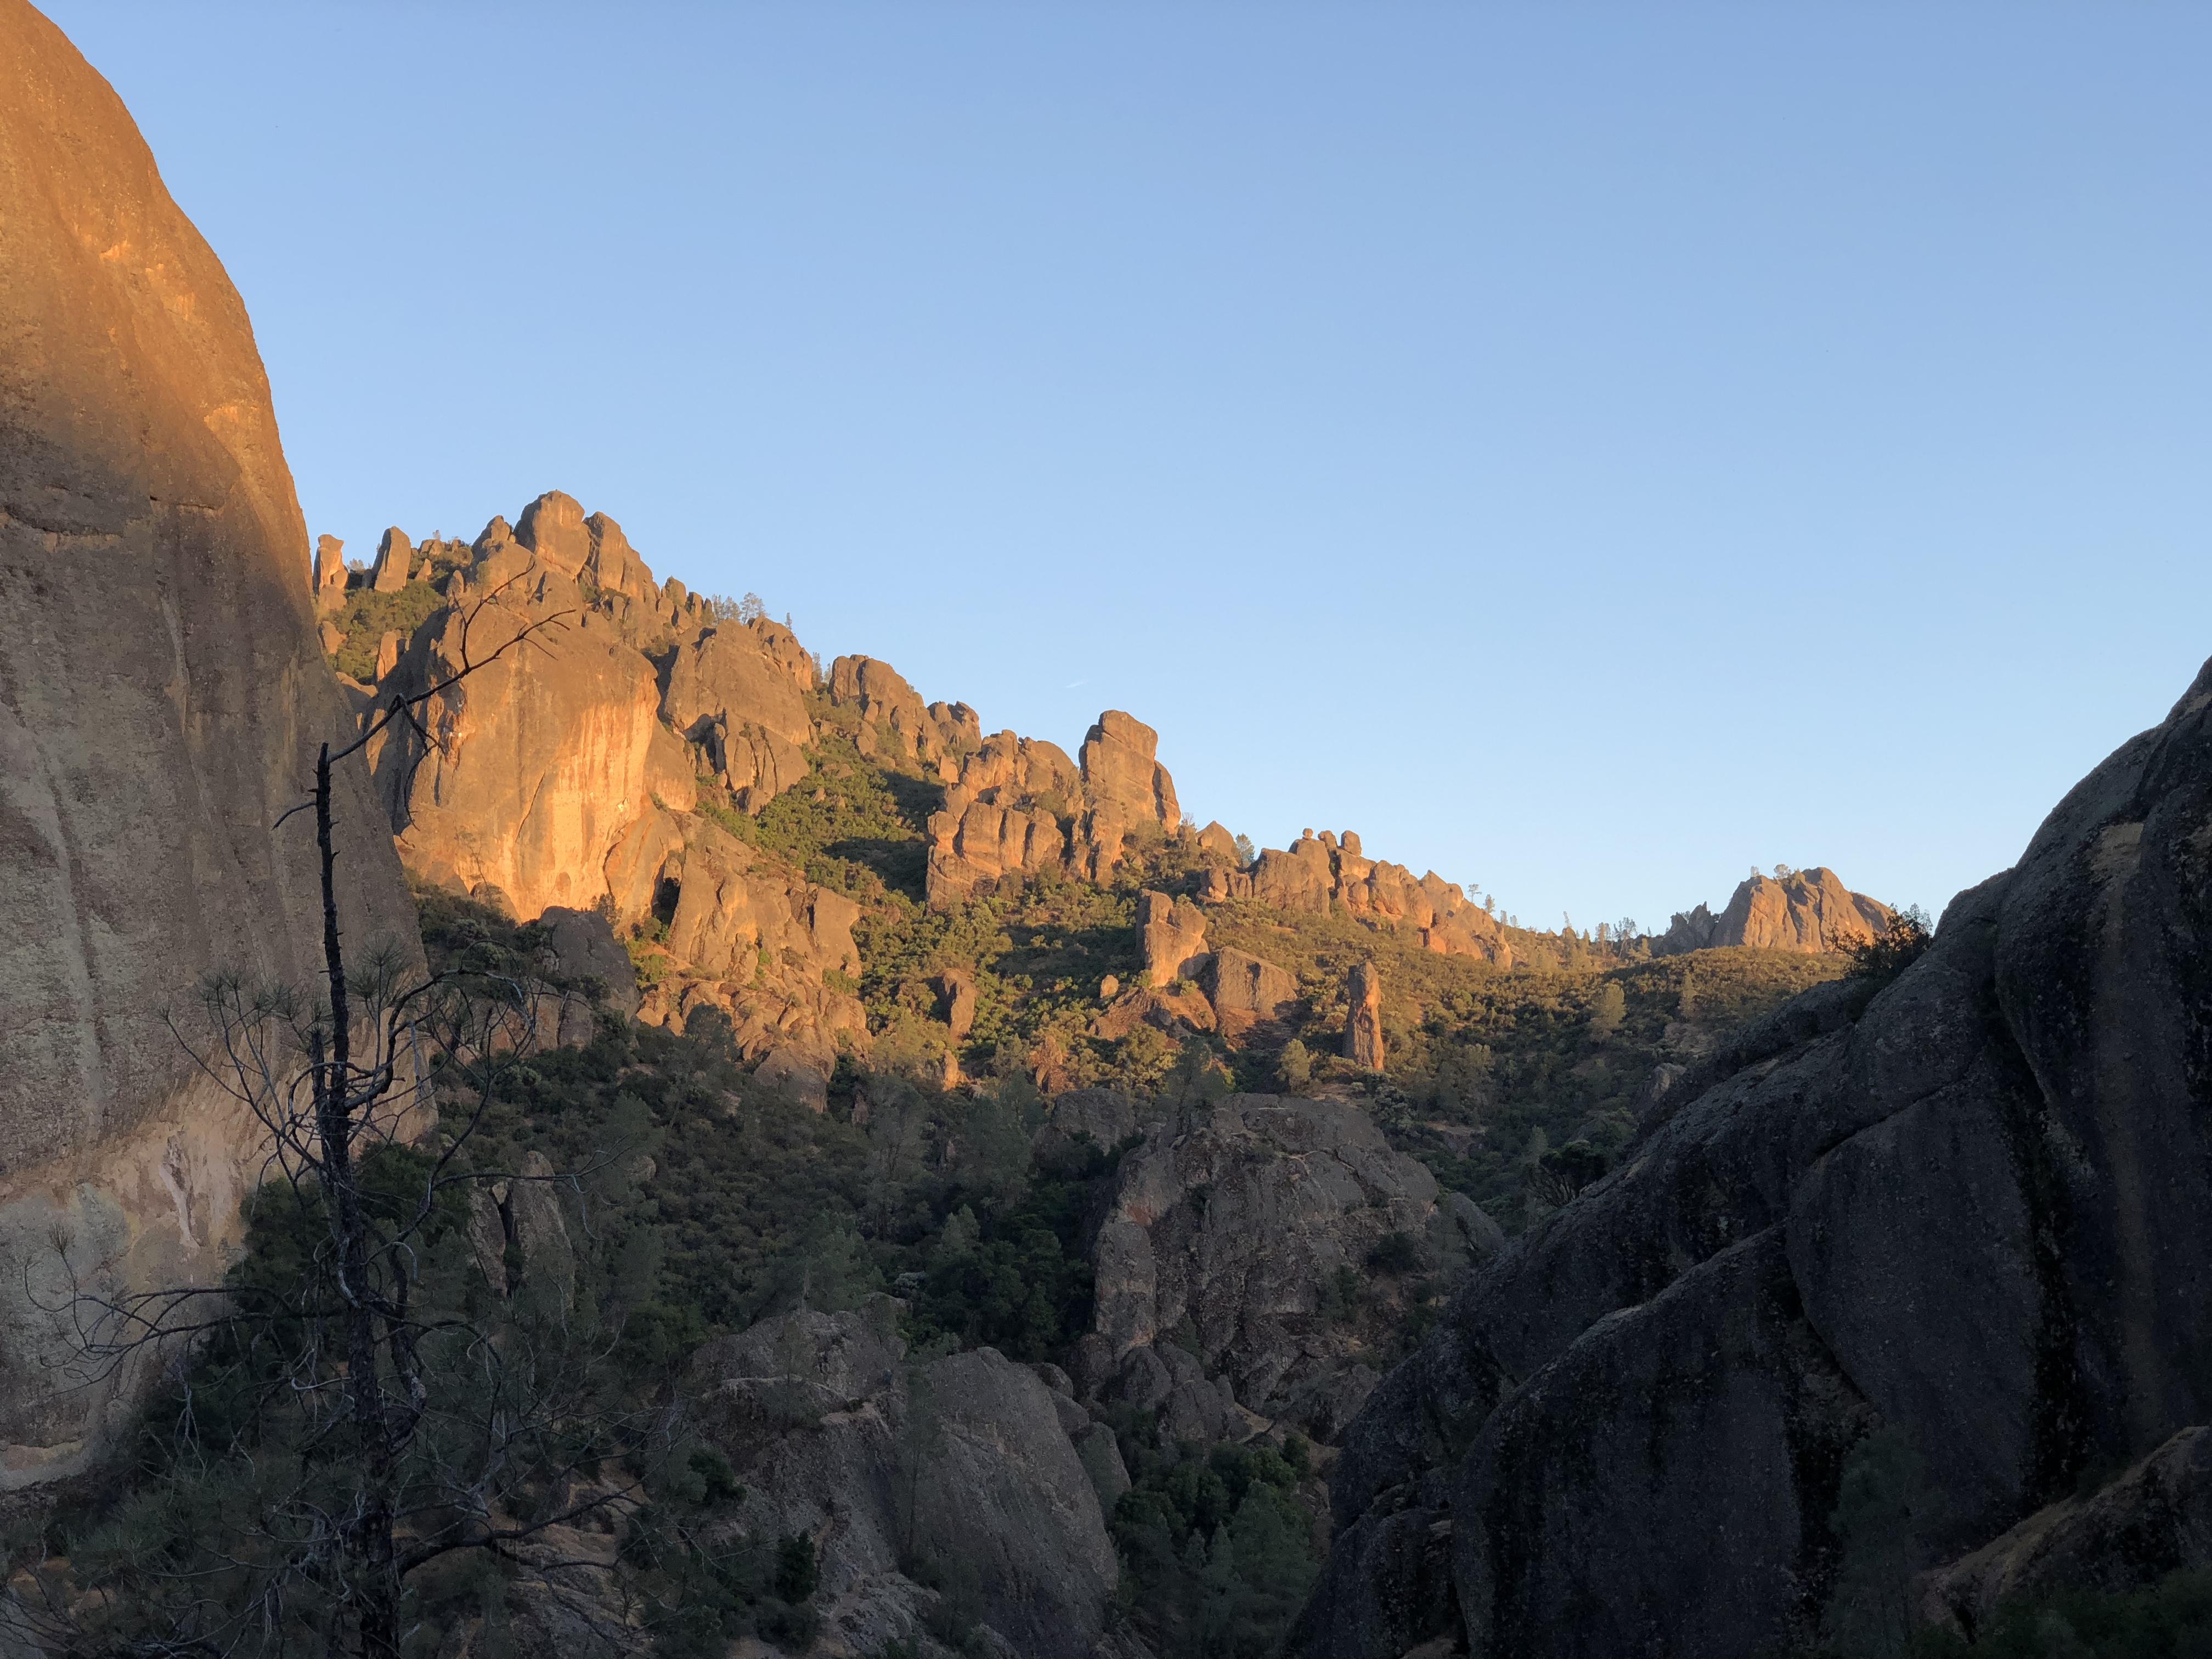 Fantastic sunset in Pinnacles NP